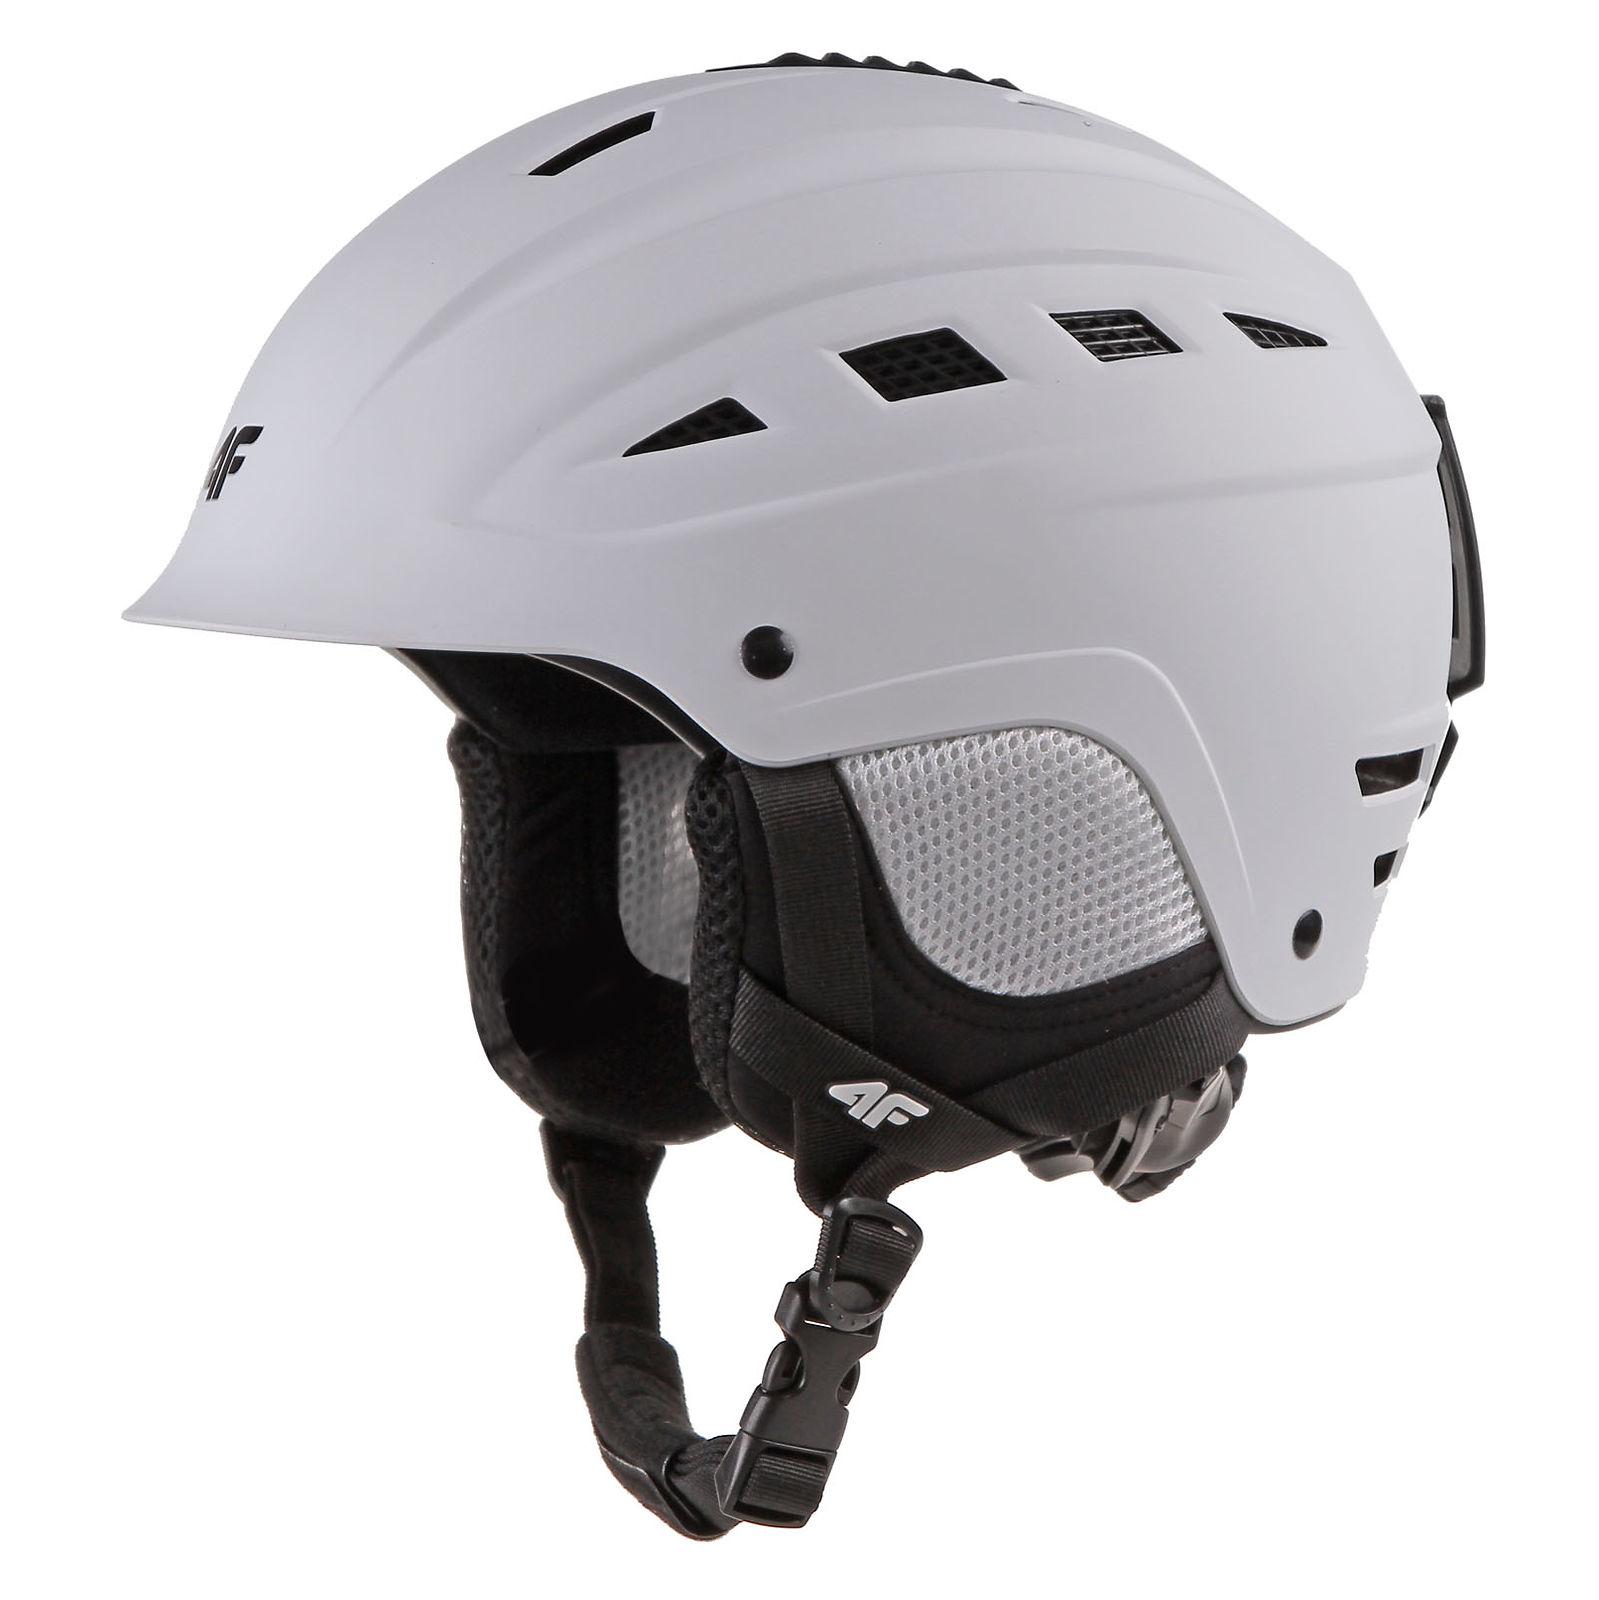 Kask narciarski 4F KSU001